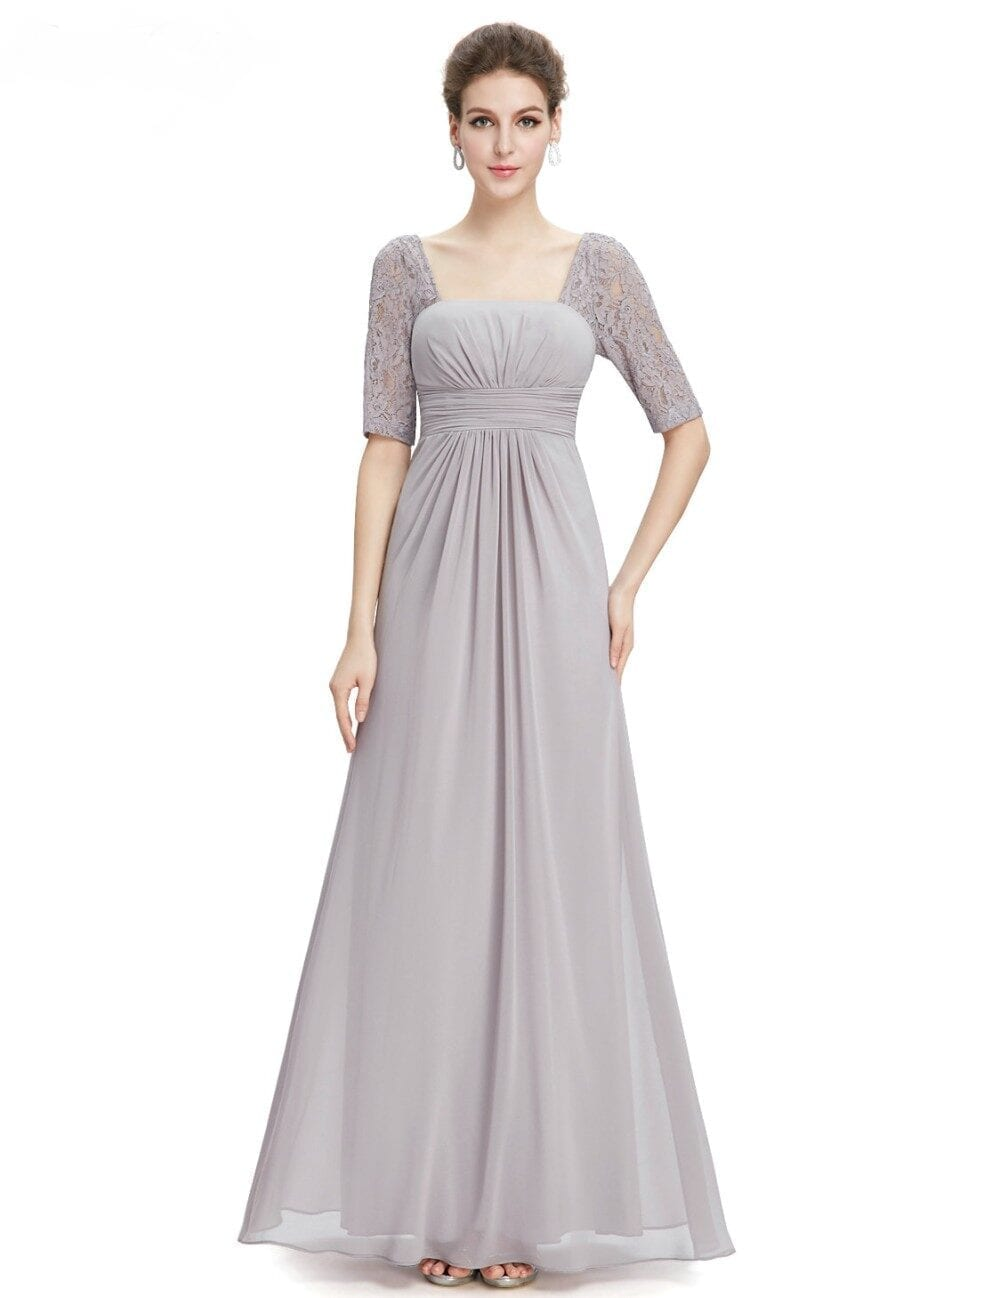 Beauty Lace Square Neckline Long Prom Evening Dress